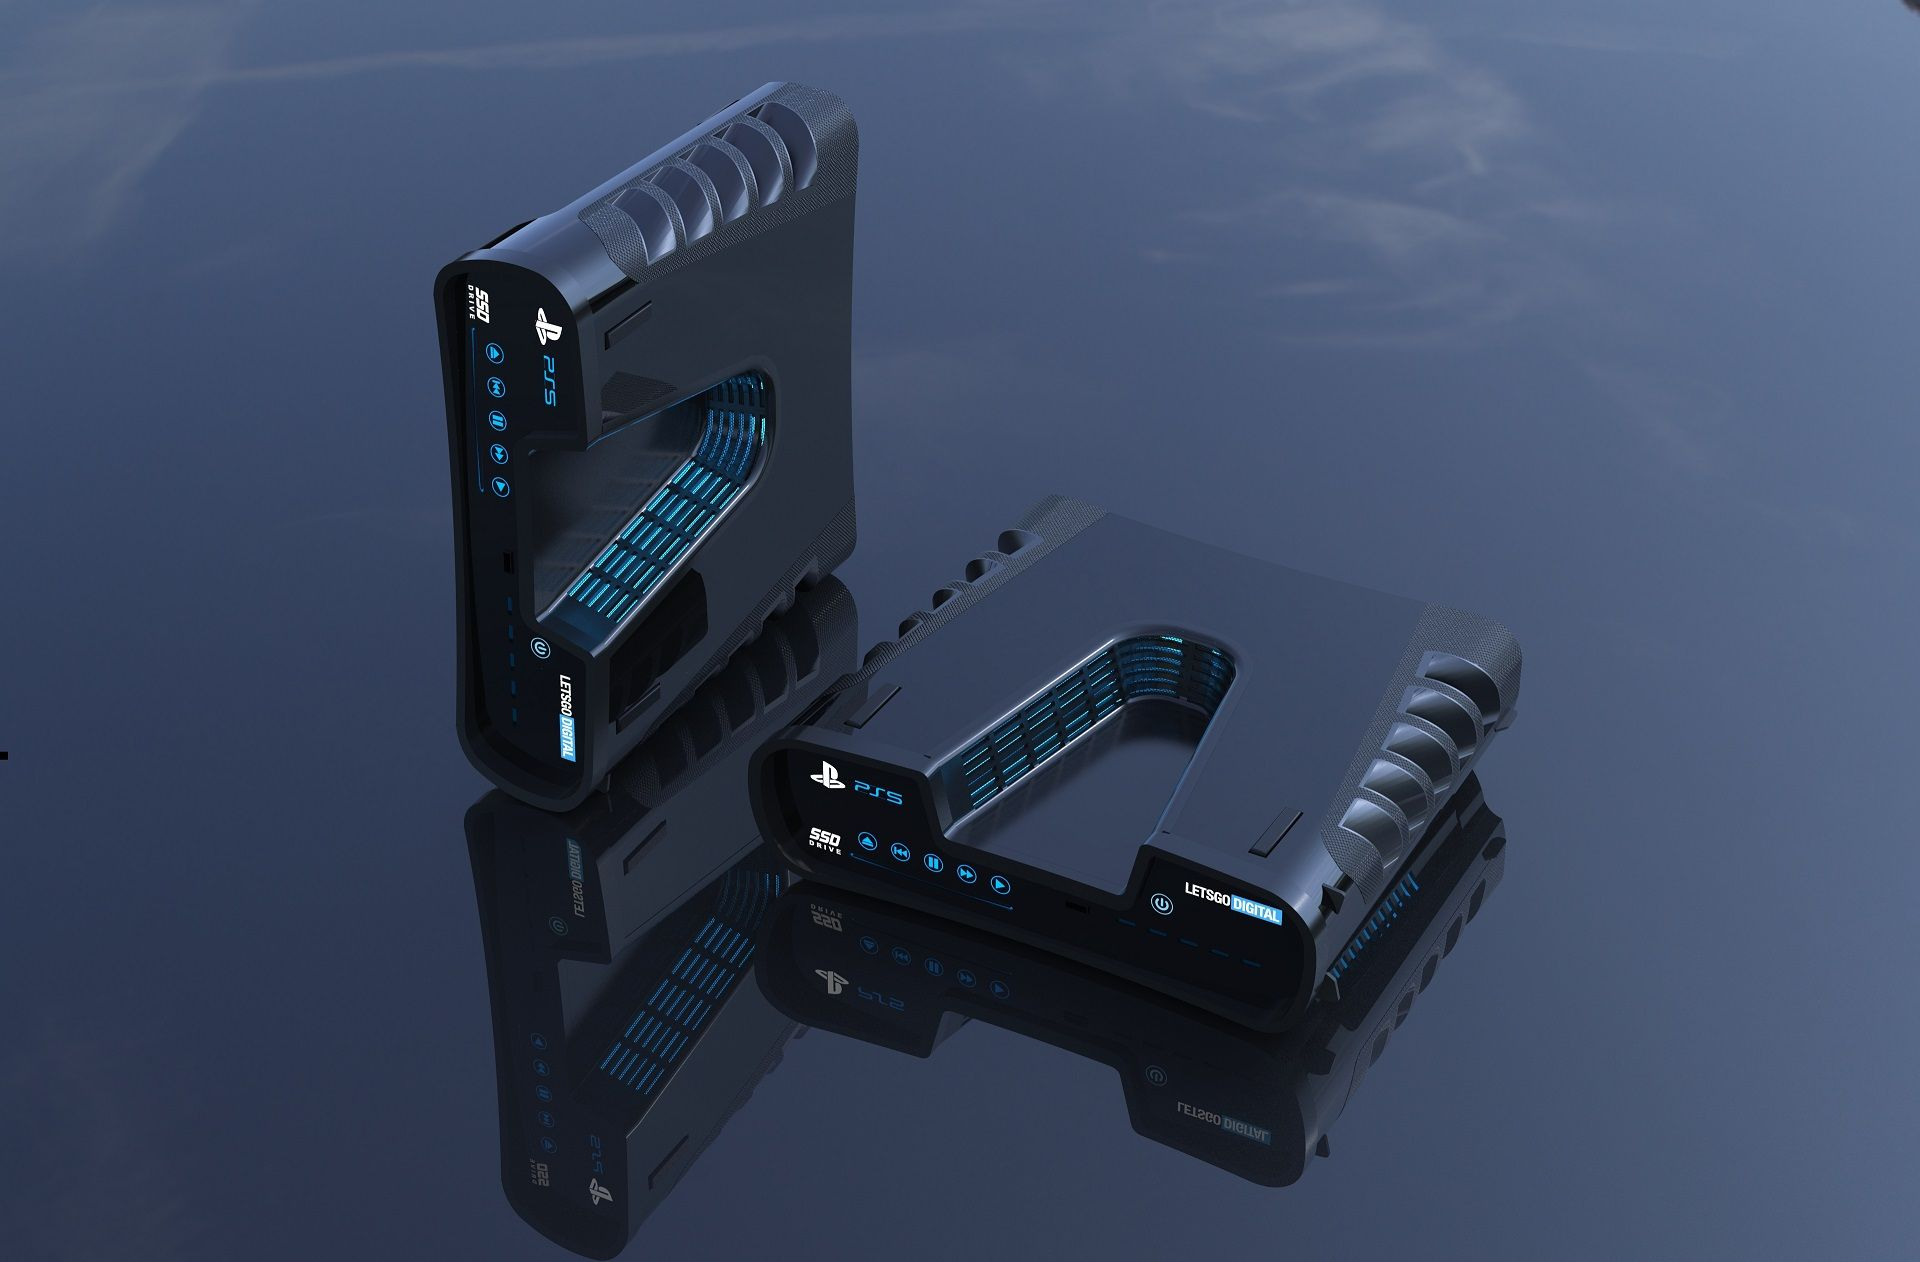 PlayStation 5 (PS5) design